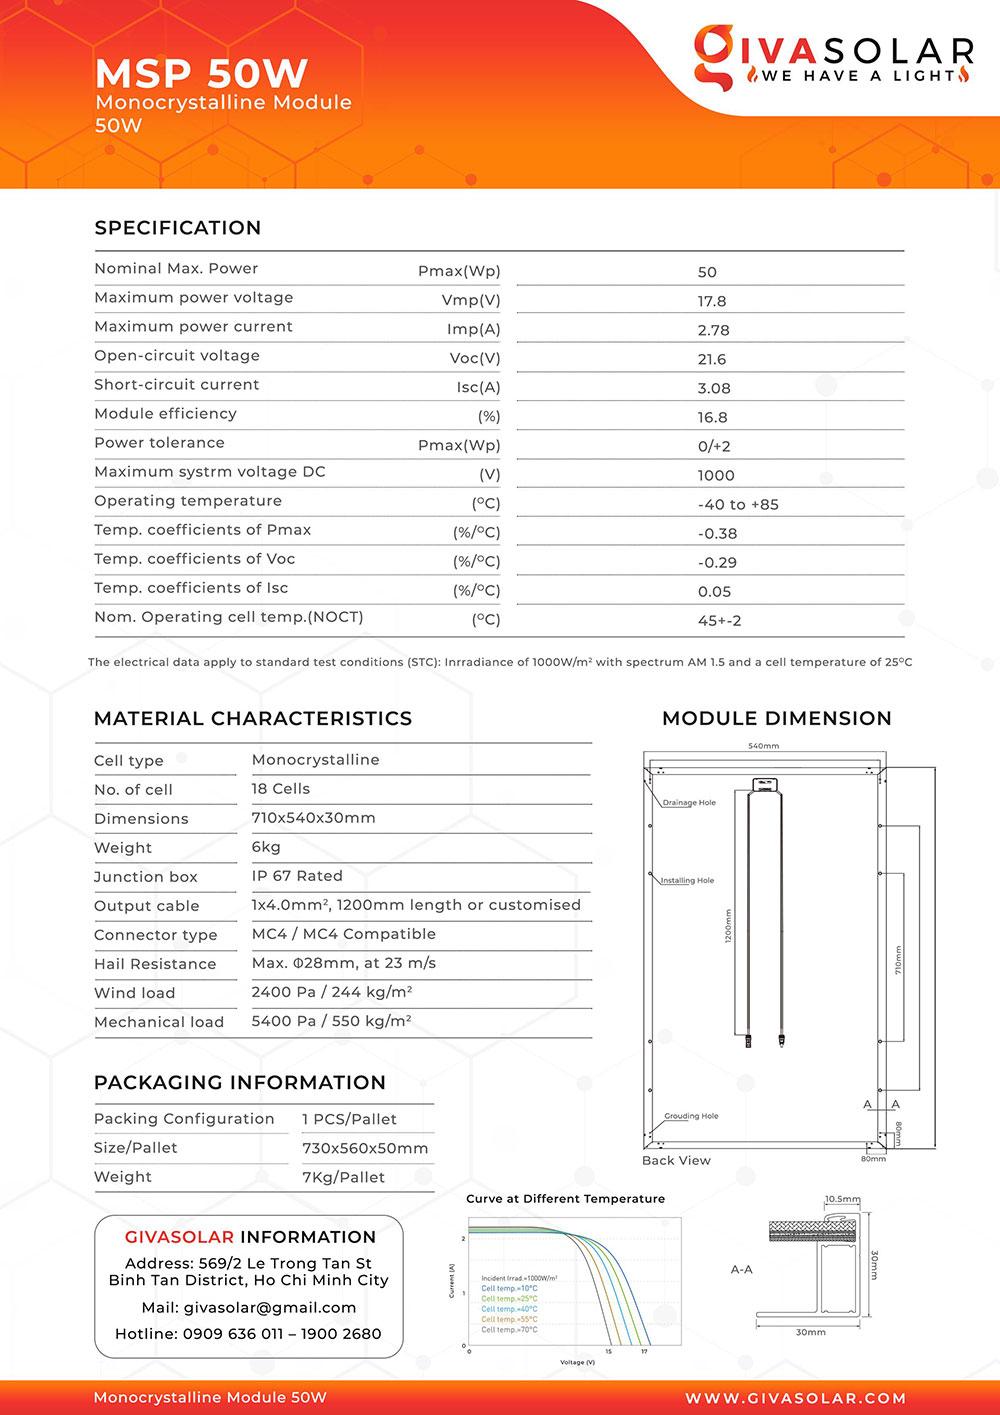 Mono MSP-50W Solar panel brochure 1